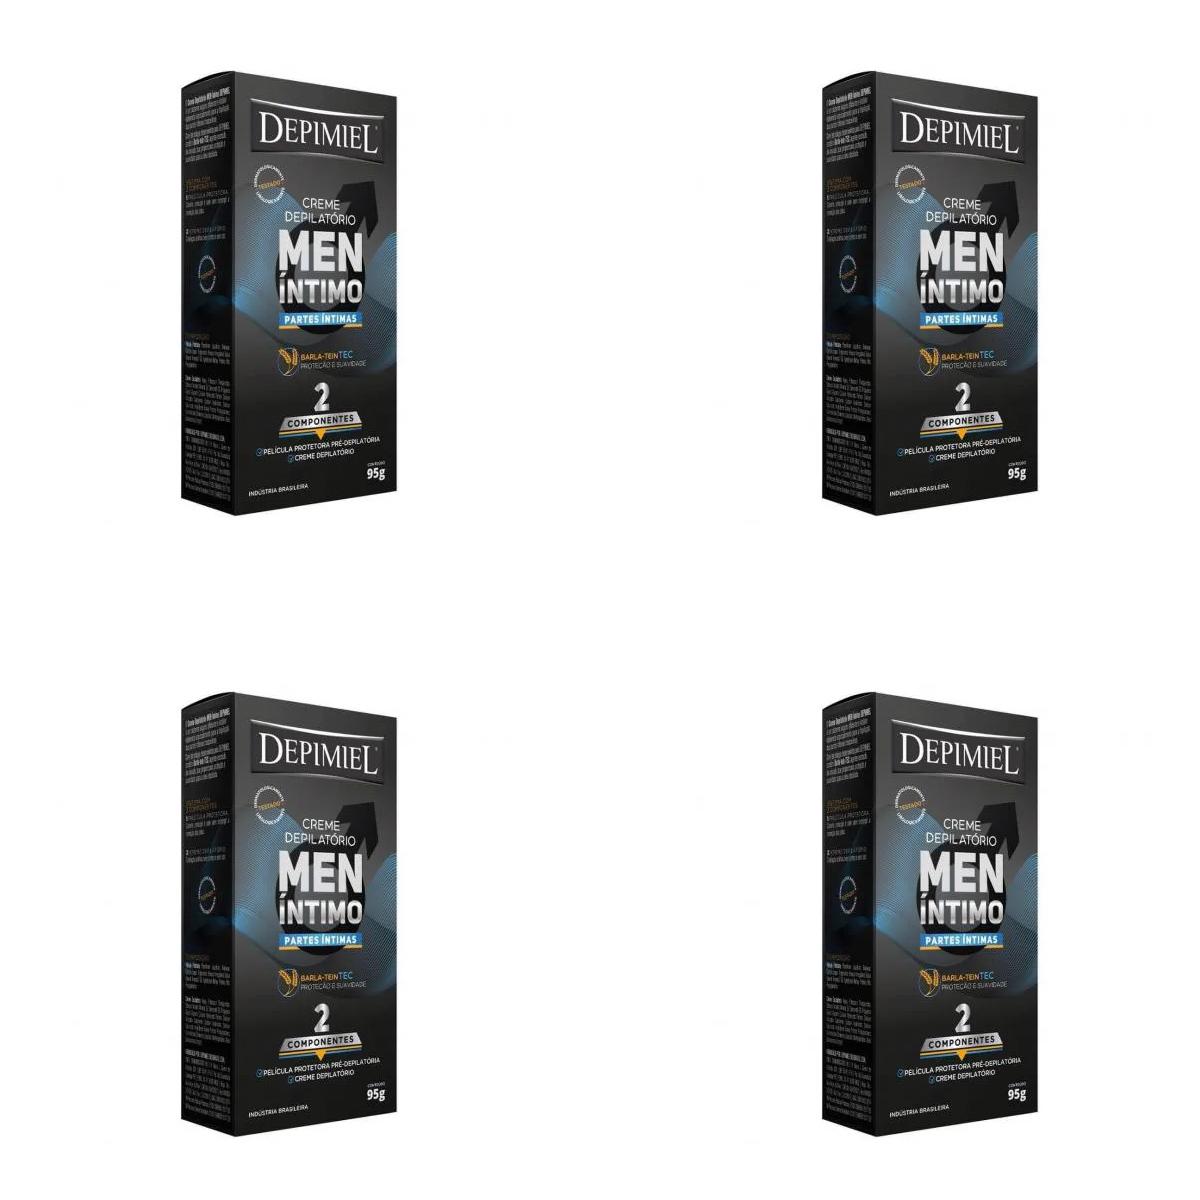 Kit 4 Unidades Creme Depilatório Masculino Partes Intimas Depimiel